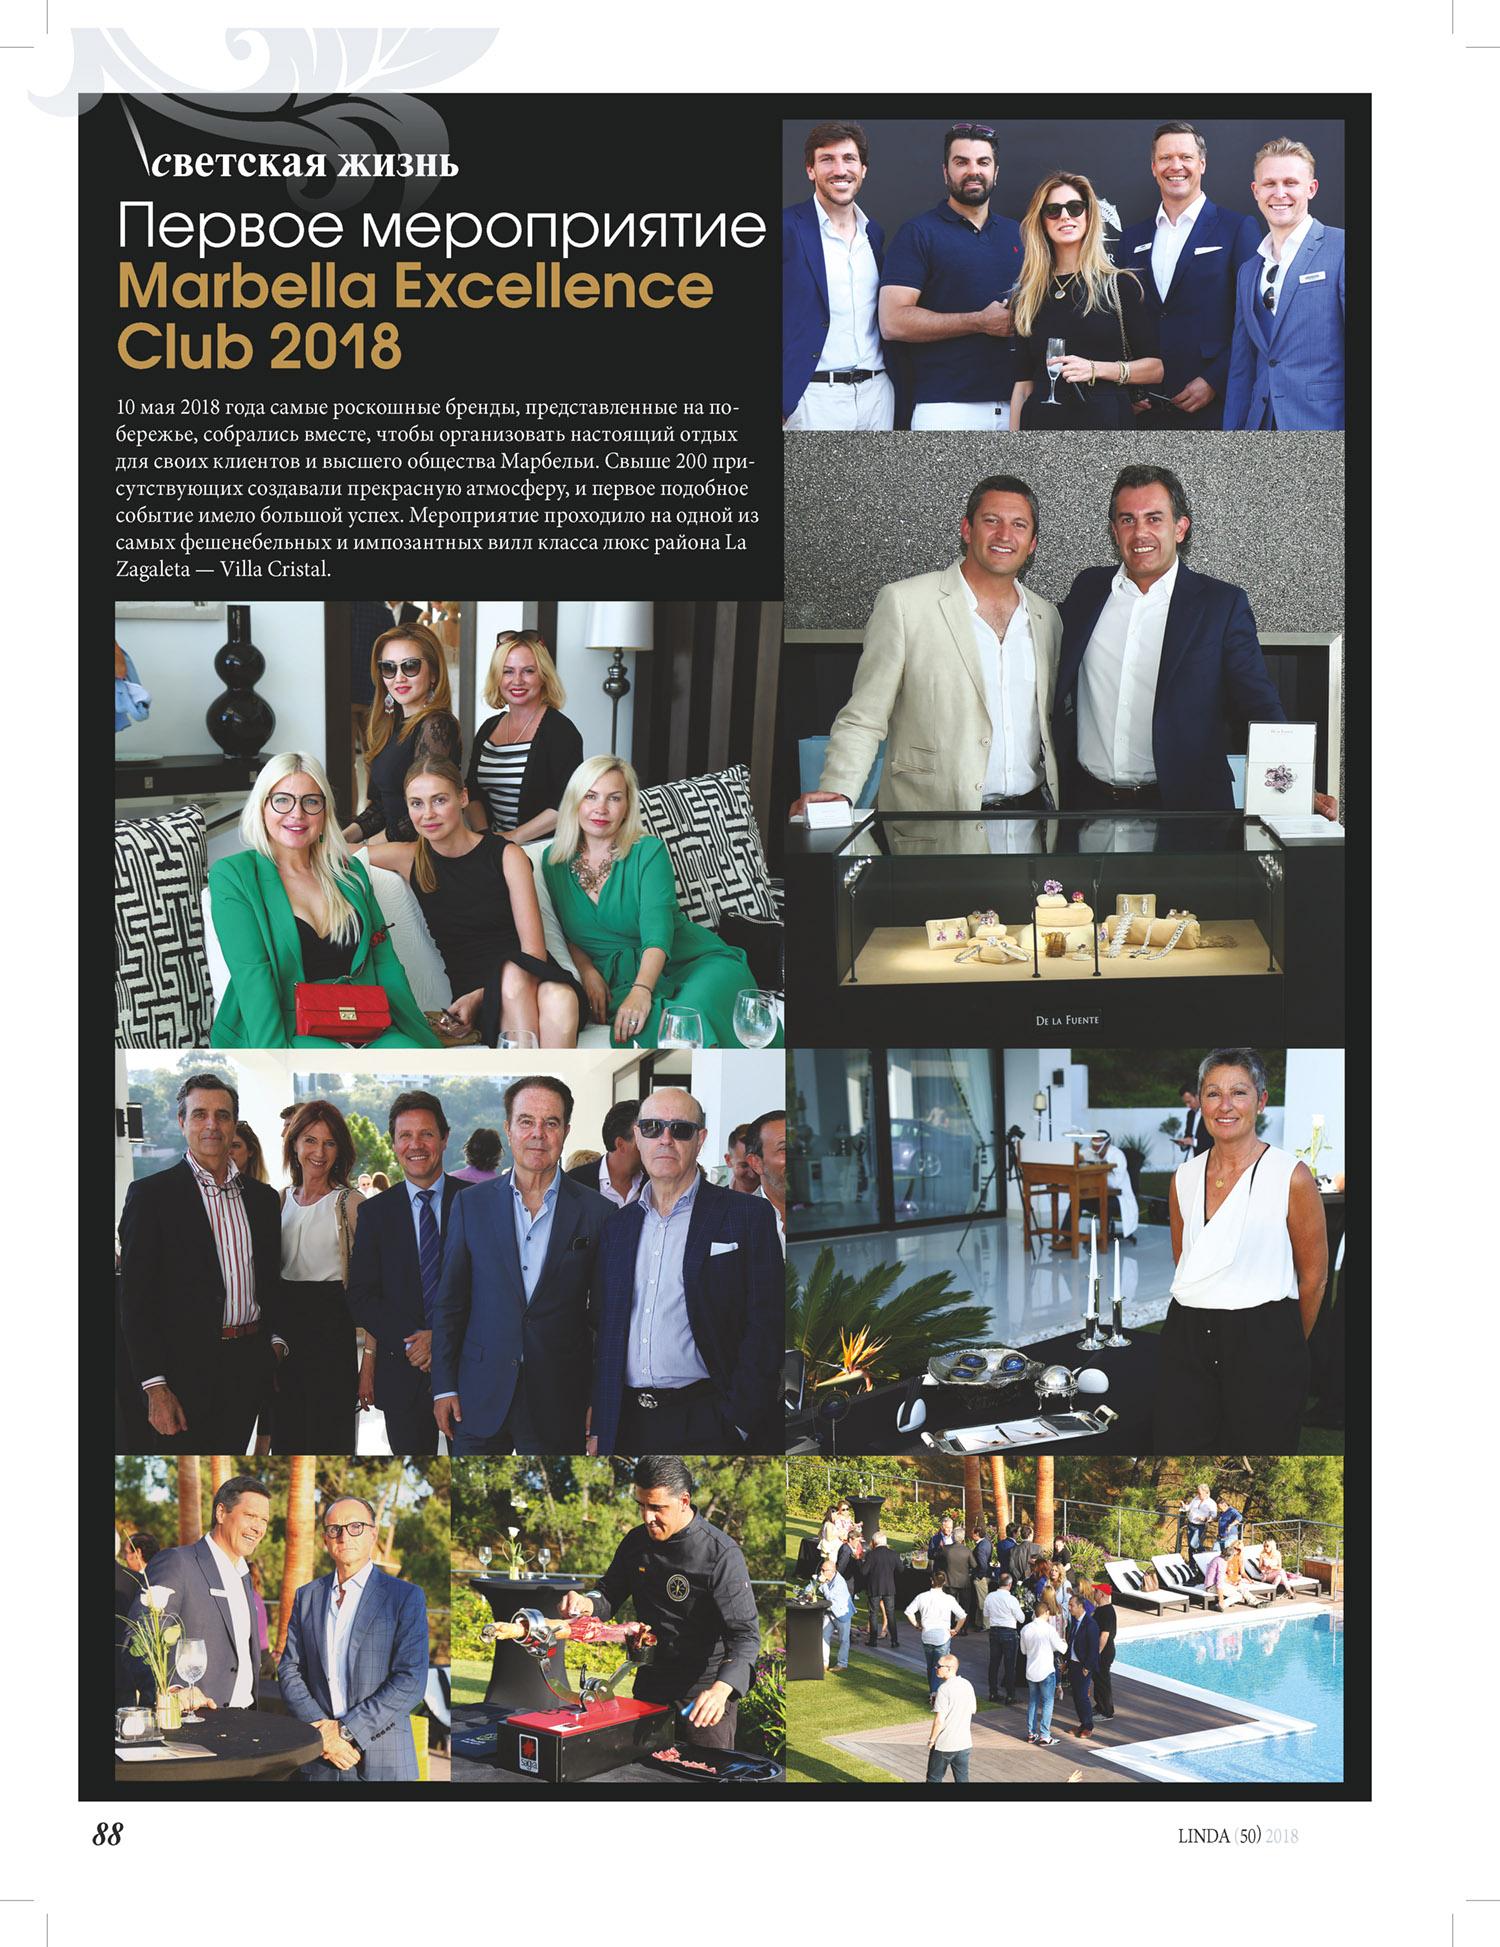 Marbella Excelent Club 2018